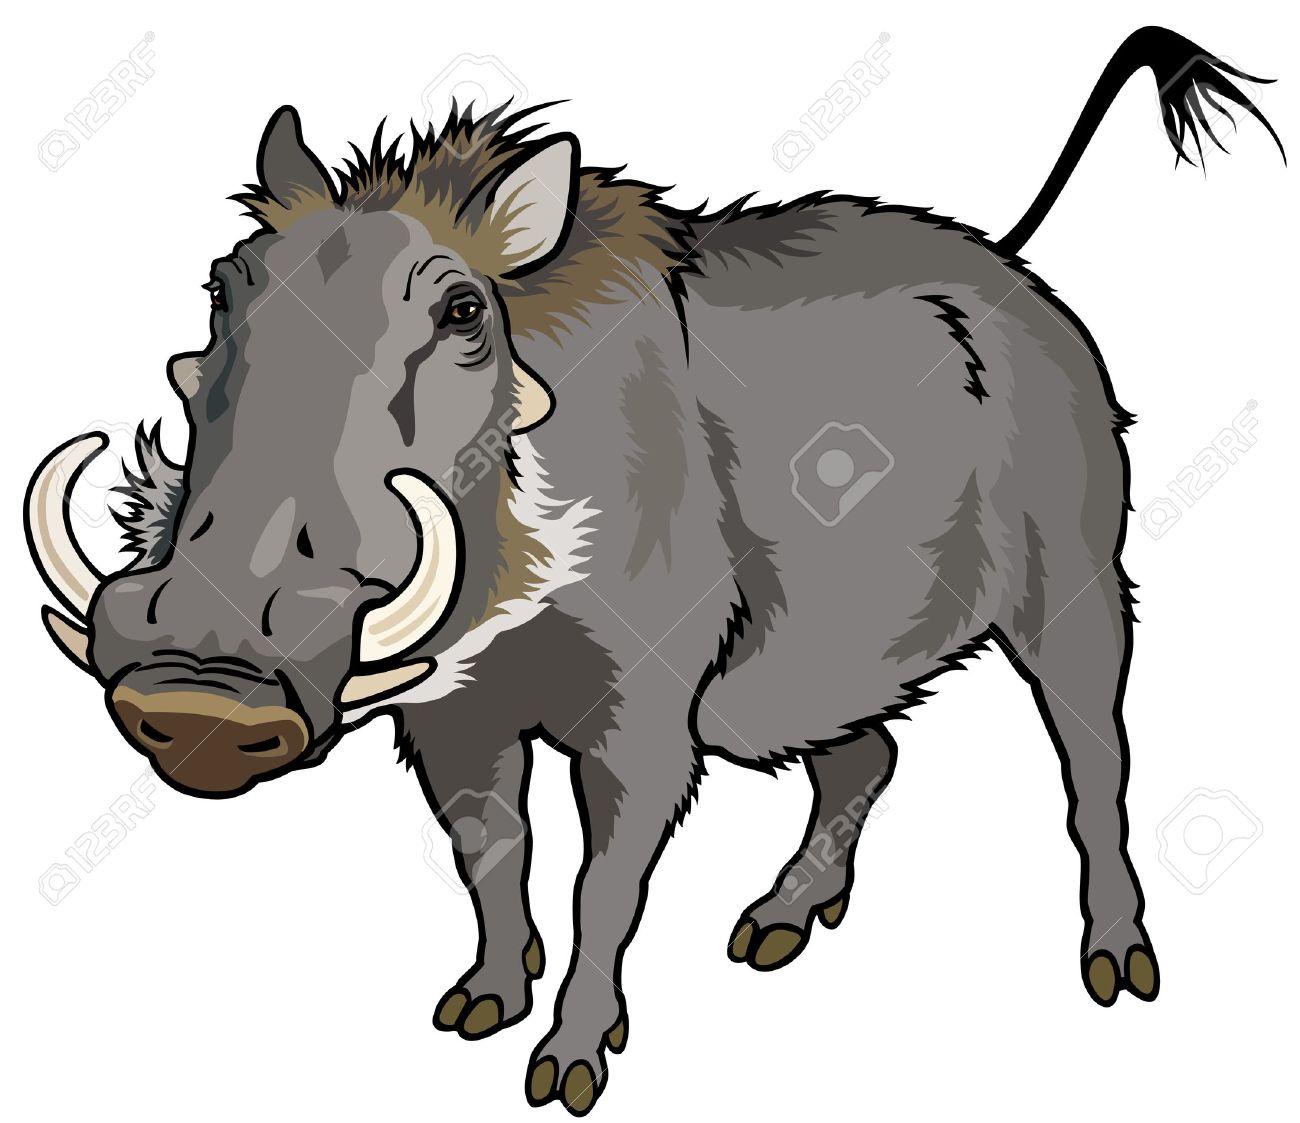 Wild hogs clipart jpg free library Cartoon Hog Pictures | Free download best Cartoon Hog ... jpg free library